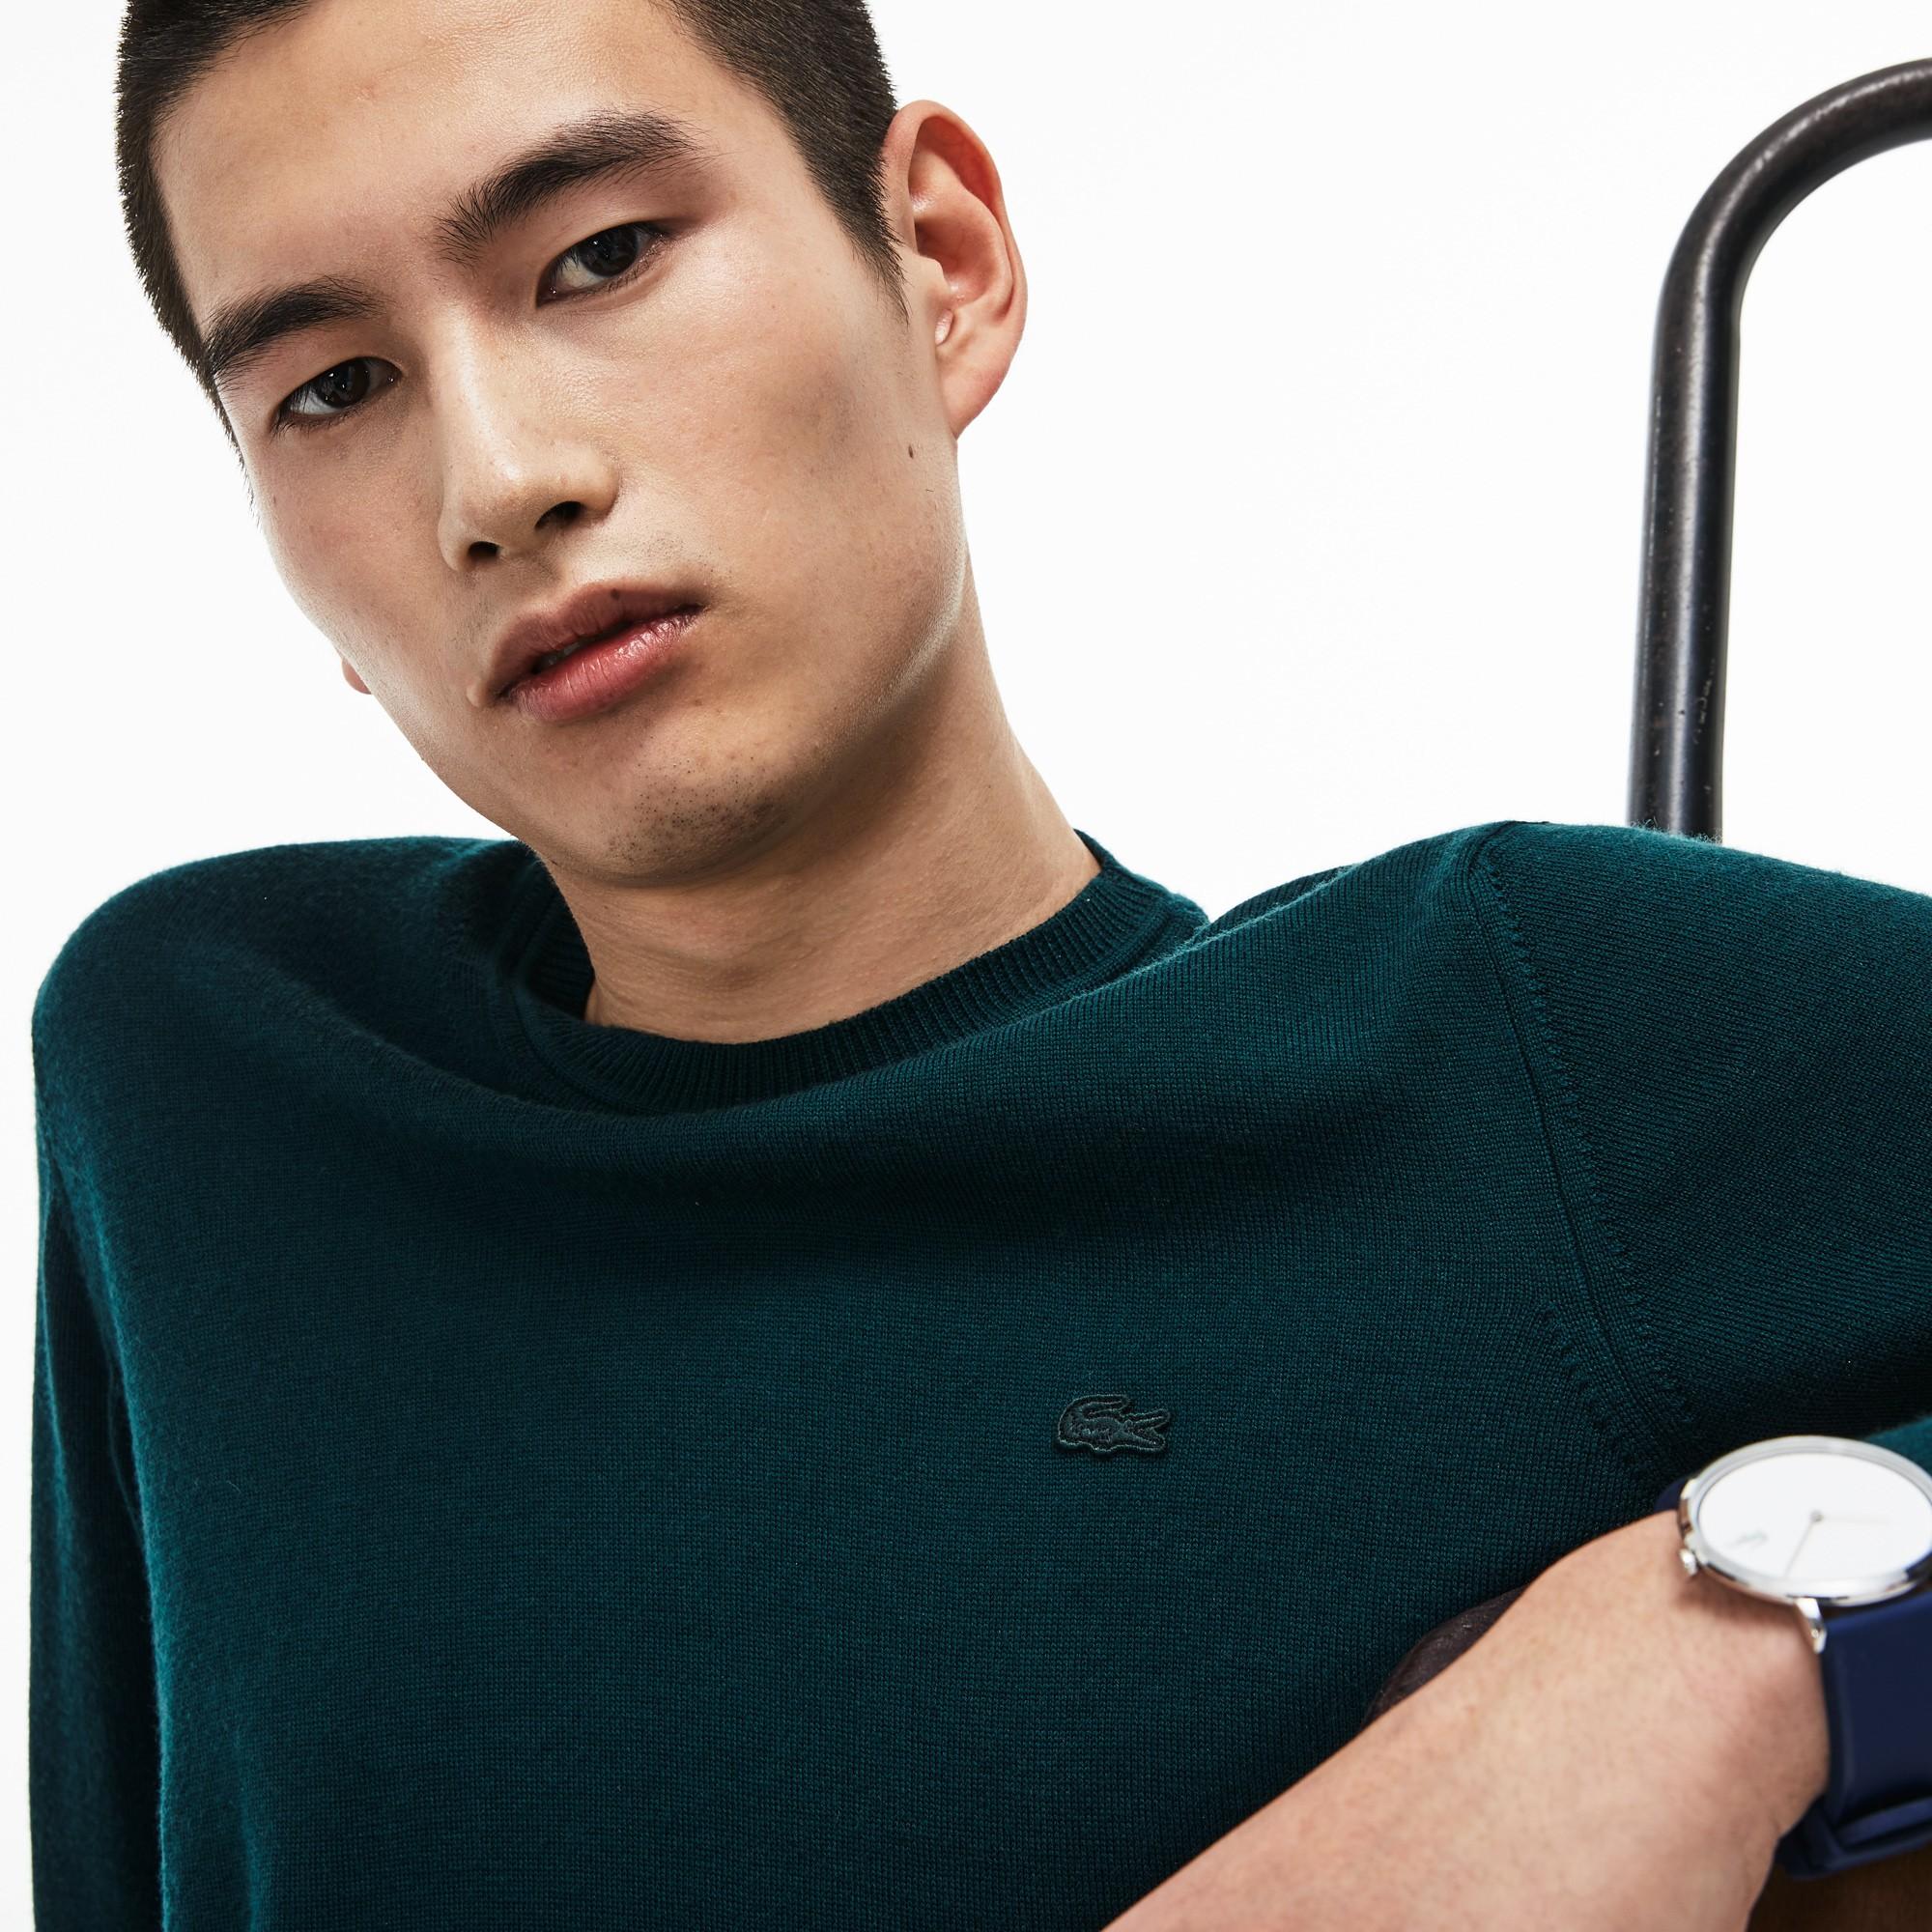 Фото 5 - Мужской свитер Lacoste зеленого цвета